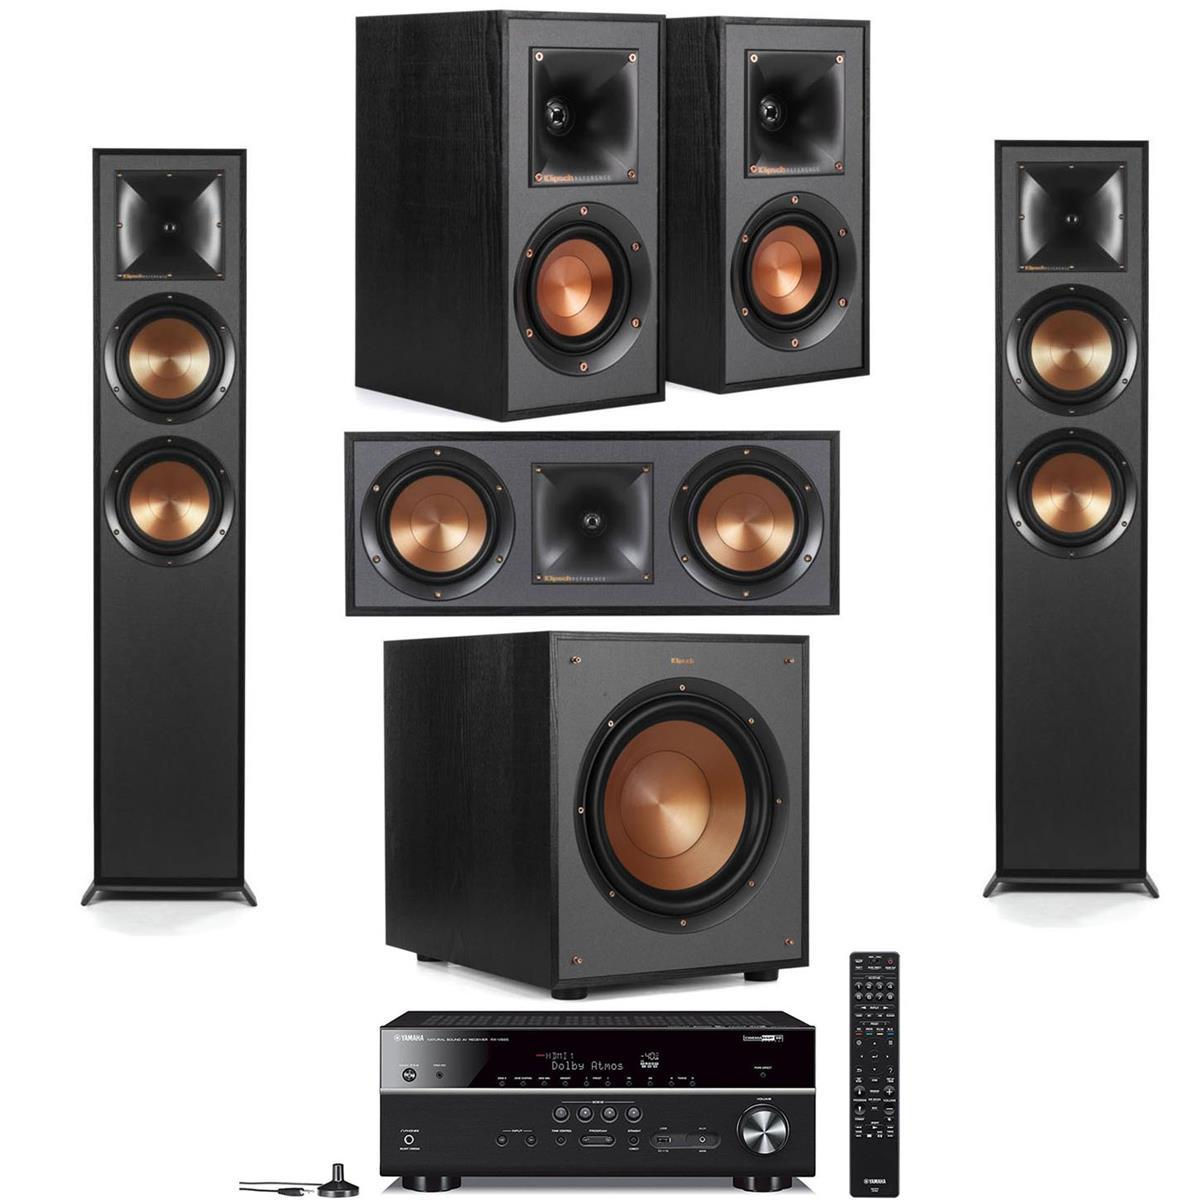 Klipsch: 2x R-625FA + 2x R-41M + R-52C + R-100SW Sub + Yamaha RX-V685 Receiver $1399 + Free Shipping